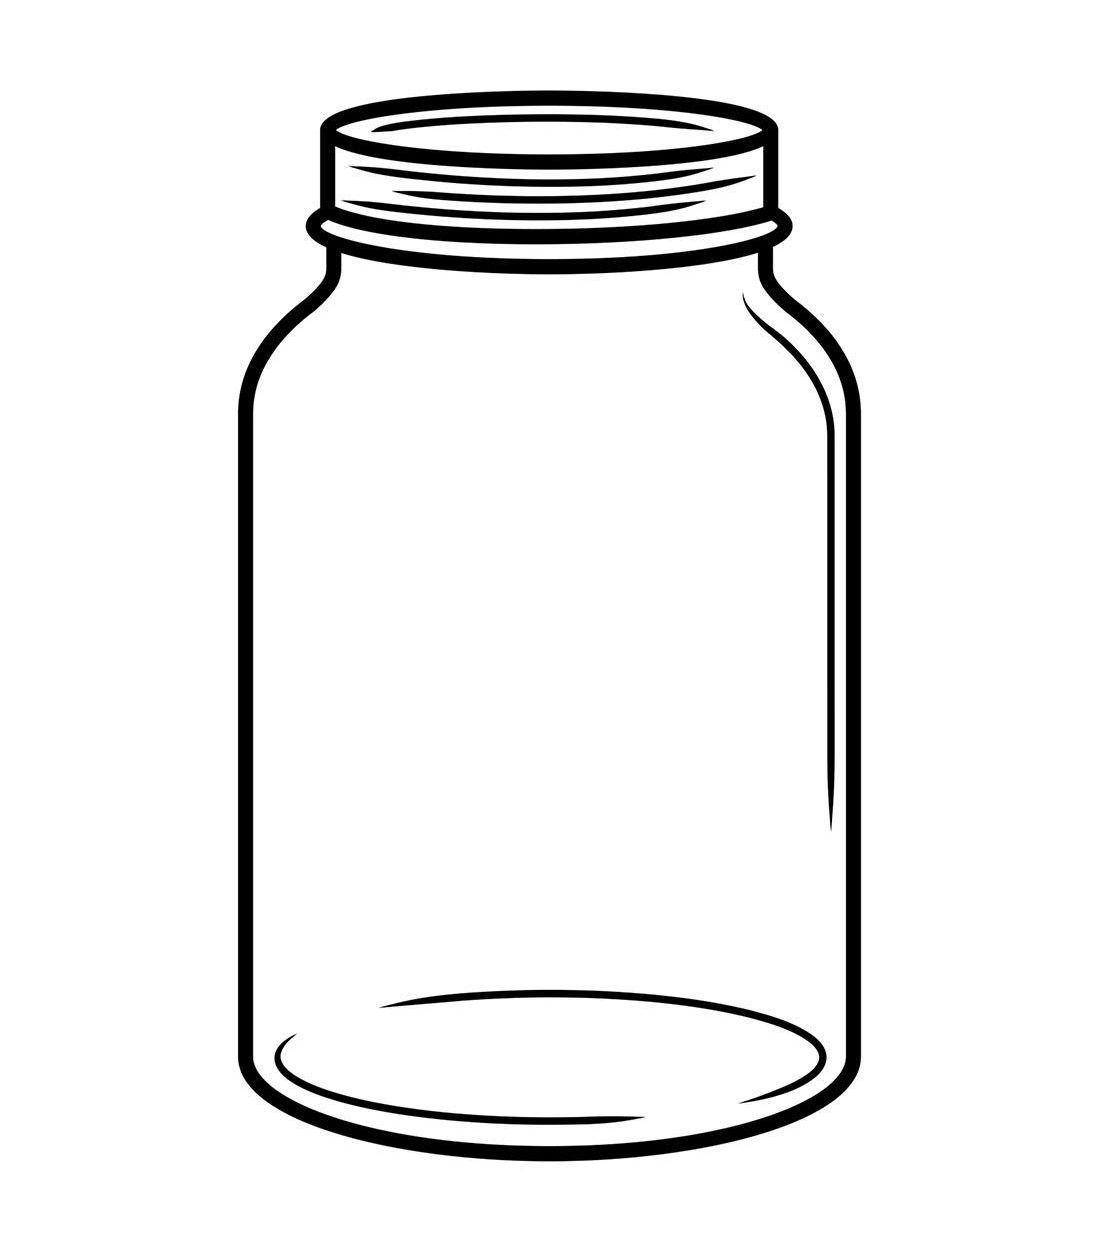 Mason jar clipart images image freeuse stock Mason Jar Outline Svg Drawing Printable Vector Jars ... image freeuse stock